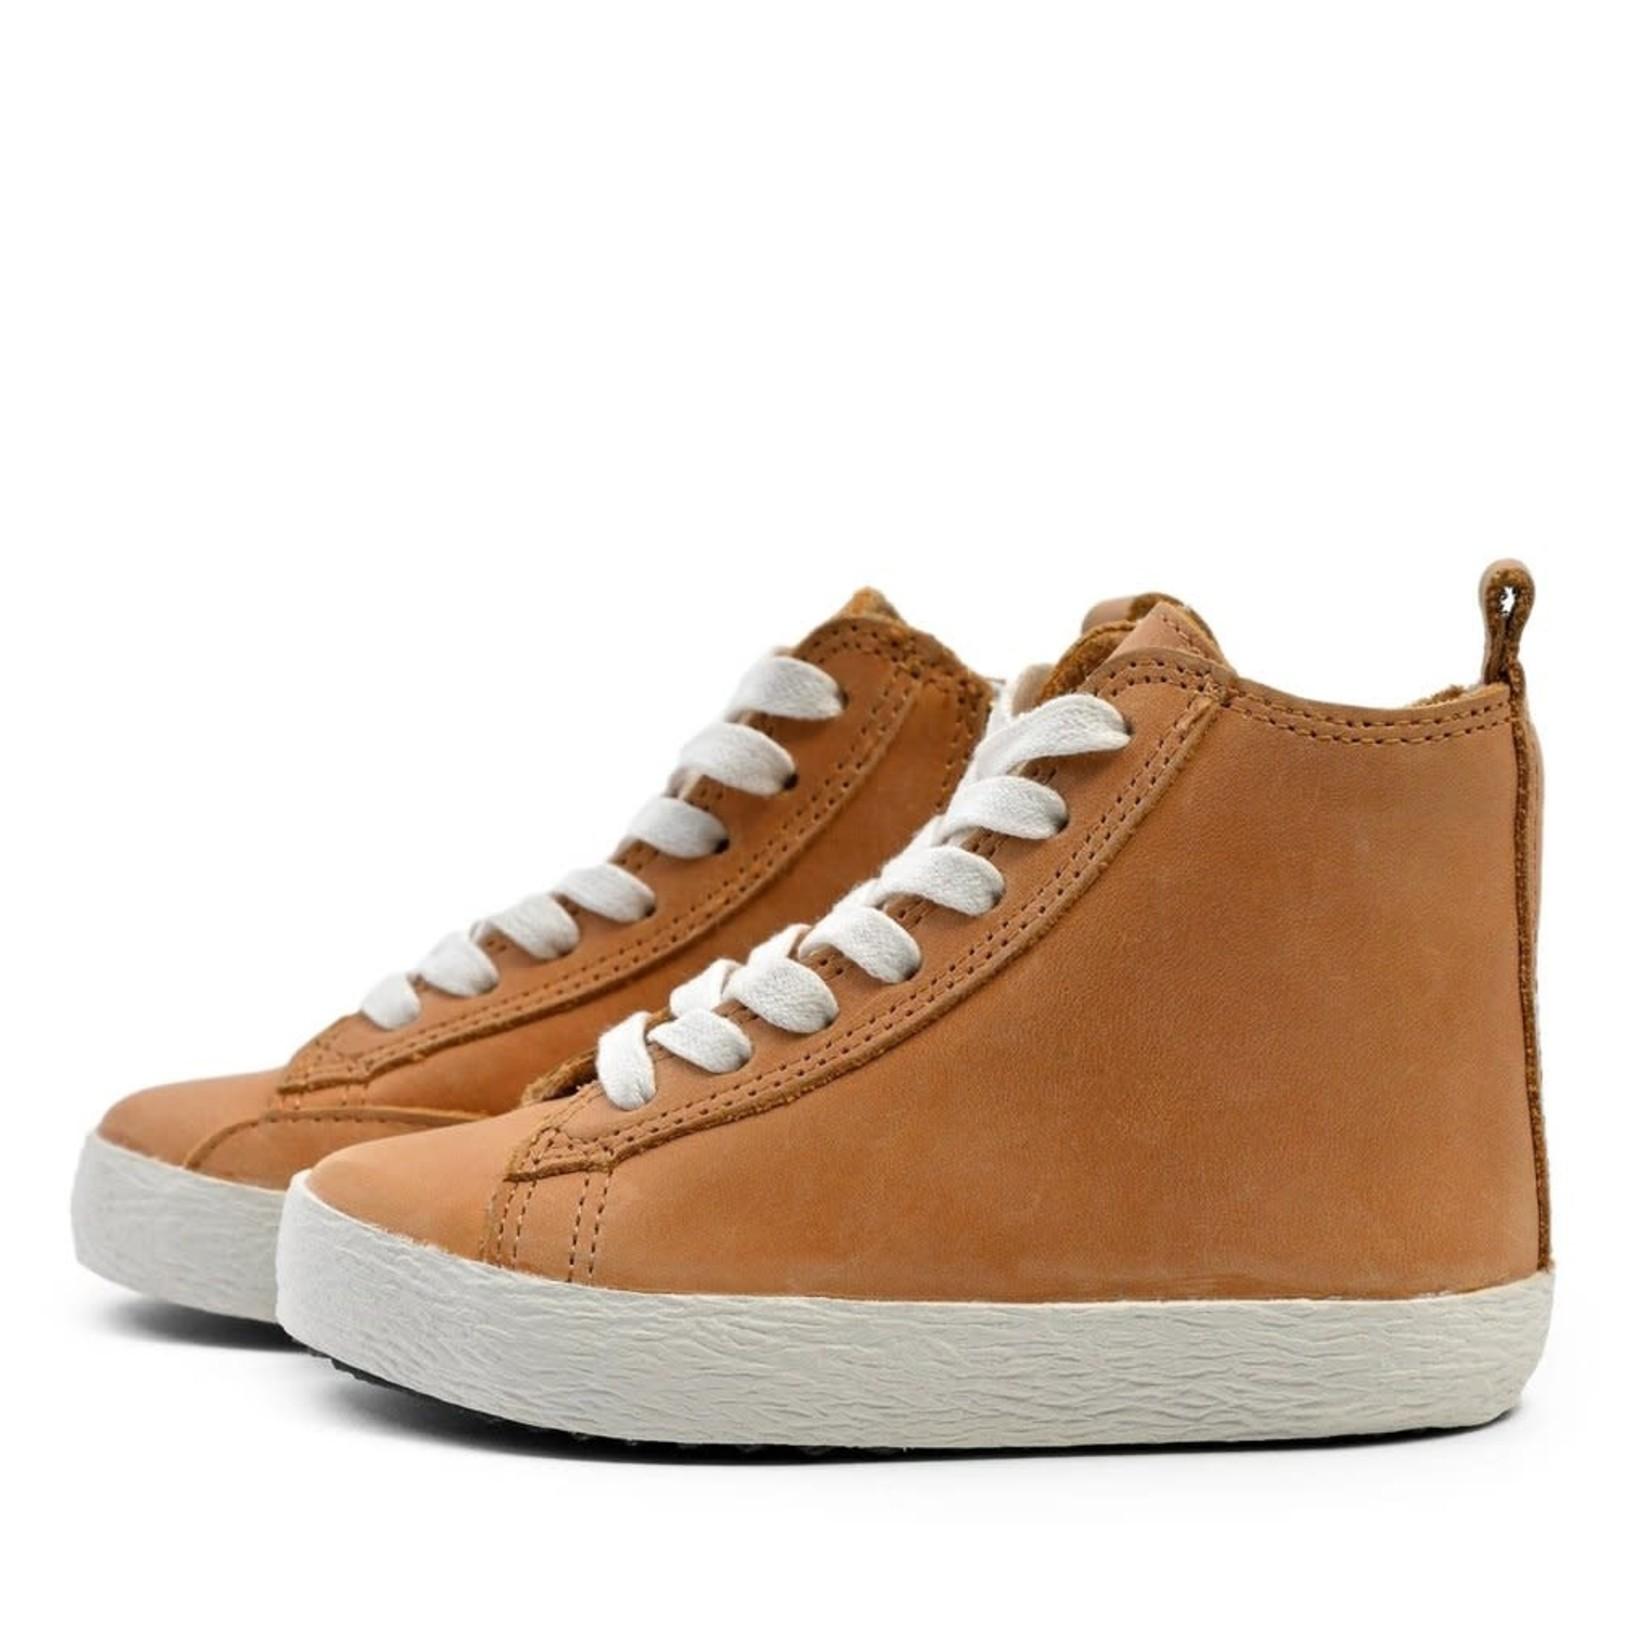 High Top Sneakers - Natural